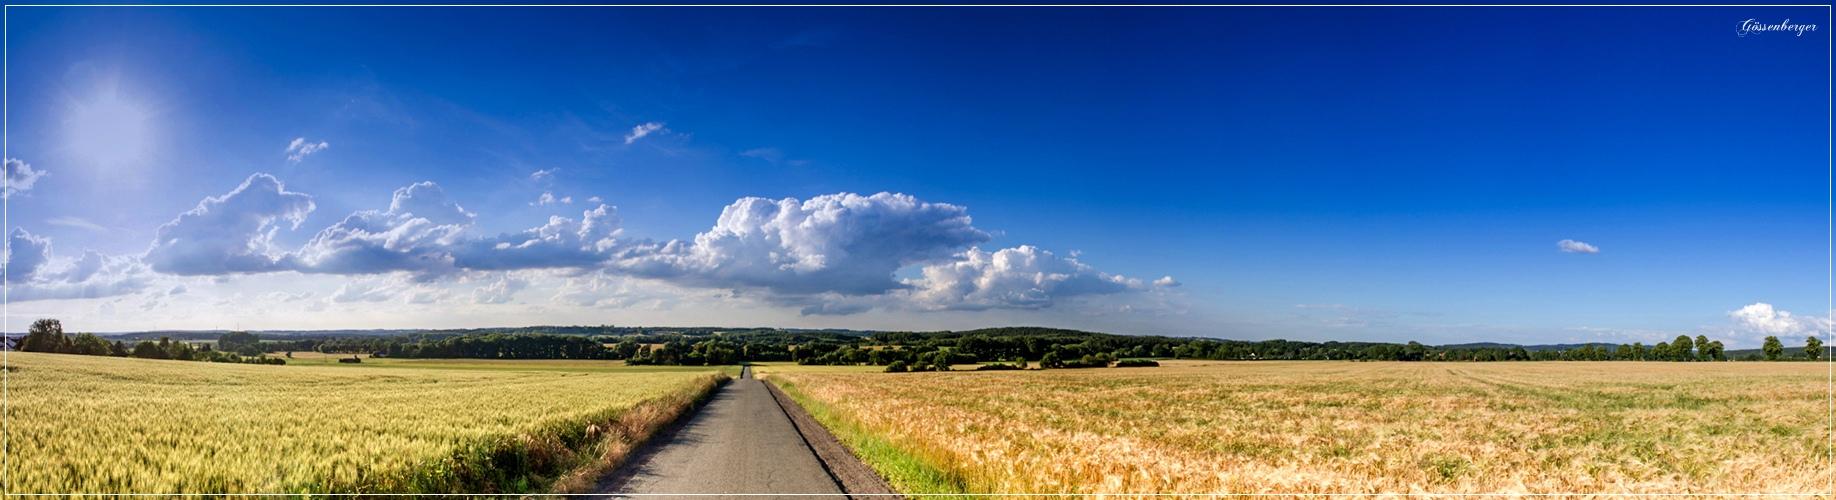 Der Weg in den Sommer ...